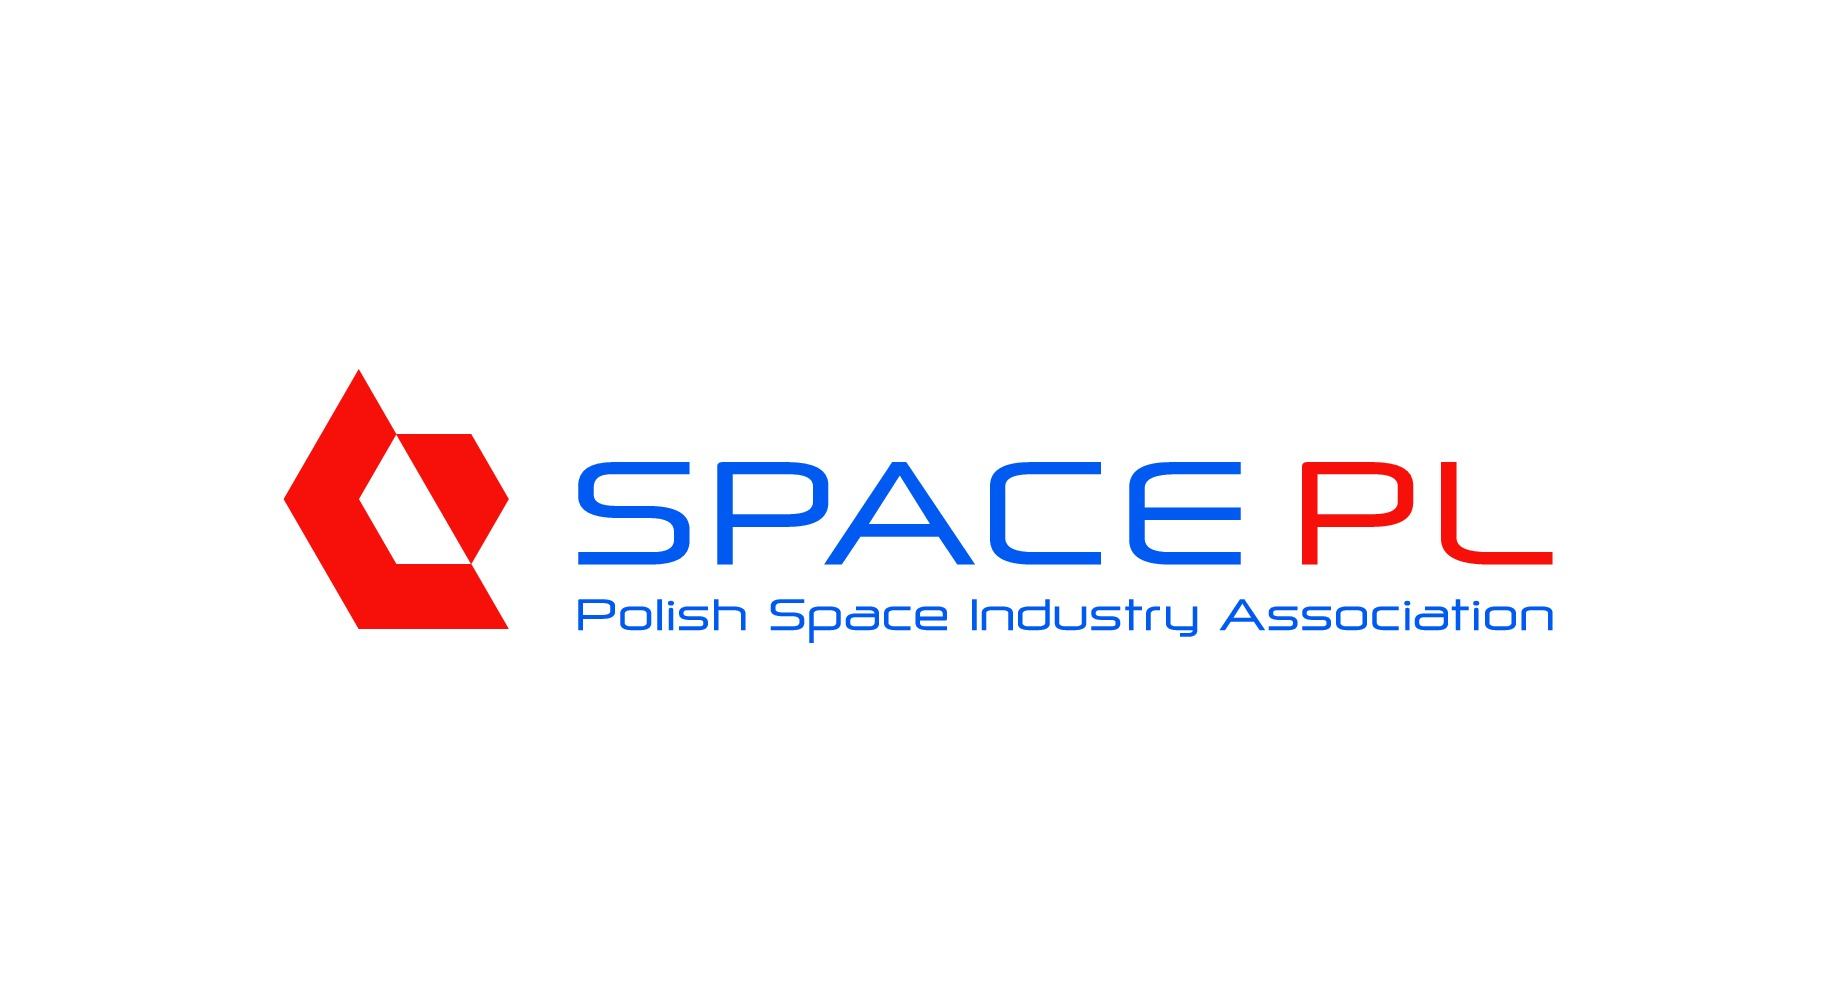 logo_kolor-nasze-space